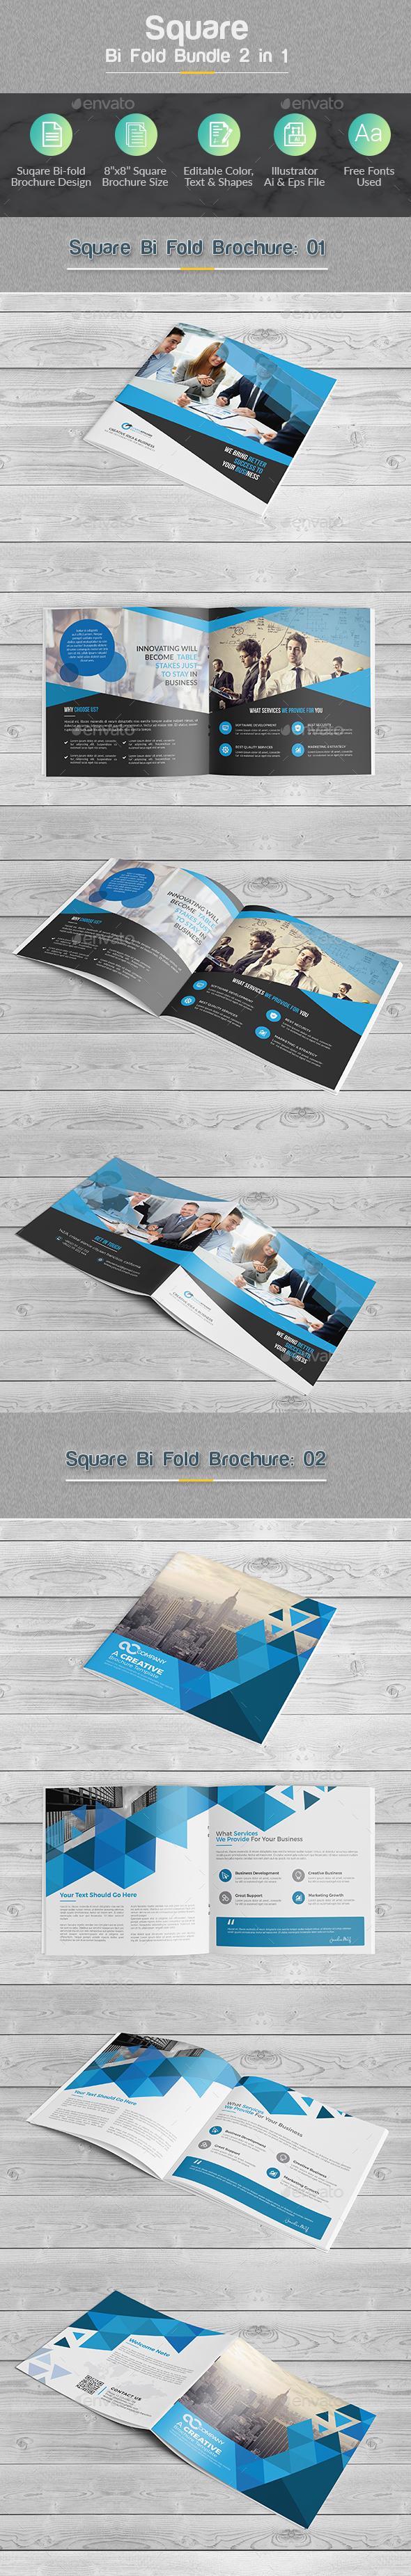 Square Bi-fold Brochure Bundle 2 in 1 - Corporate Brochures